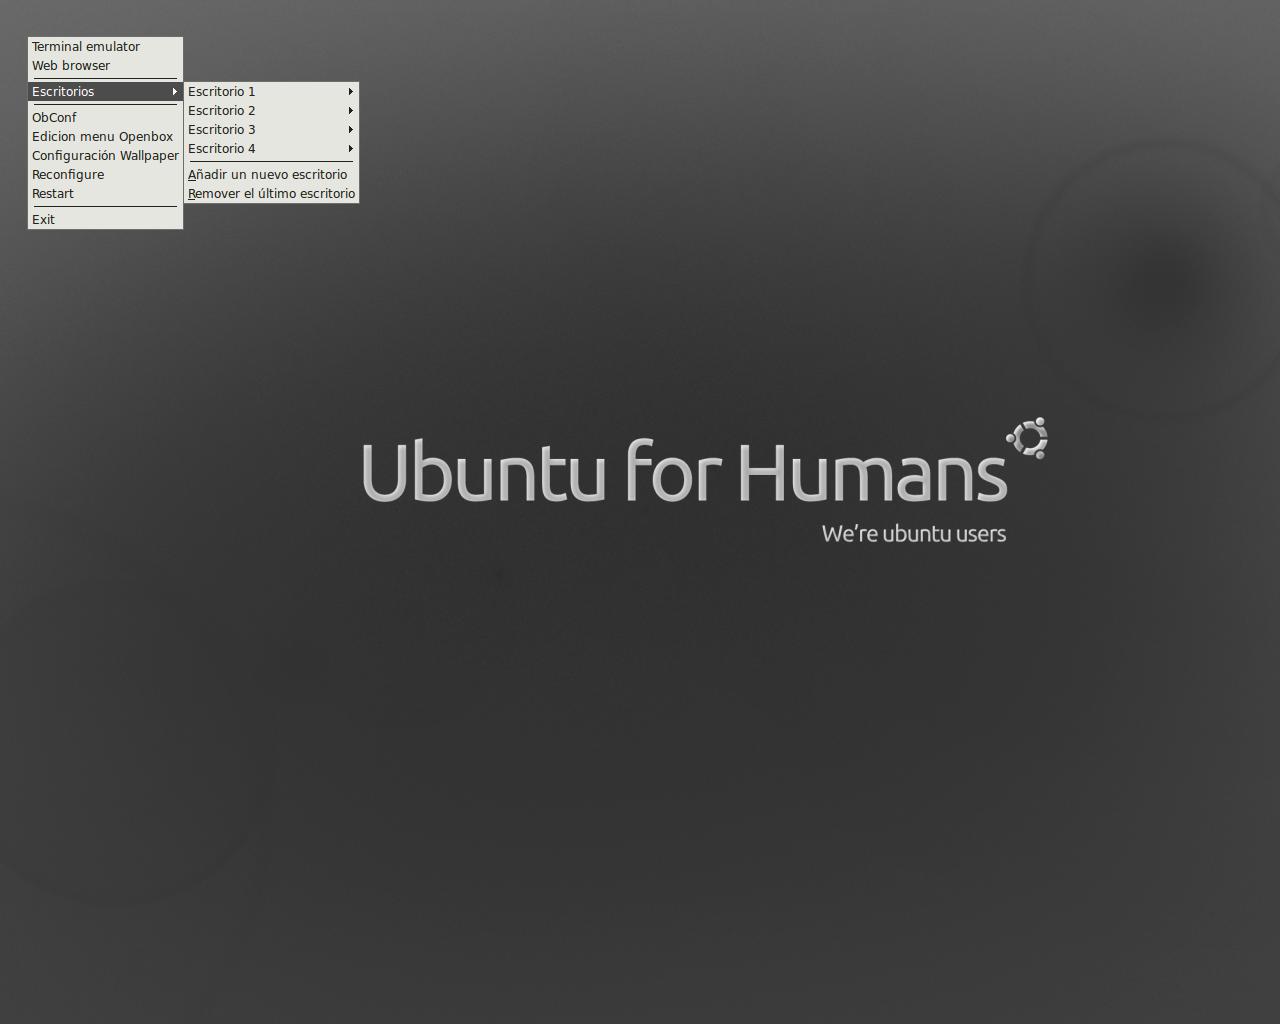 how to open ubuntu iso file on virtualbox